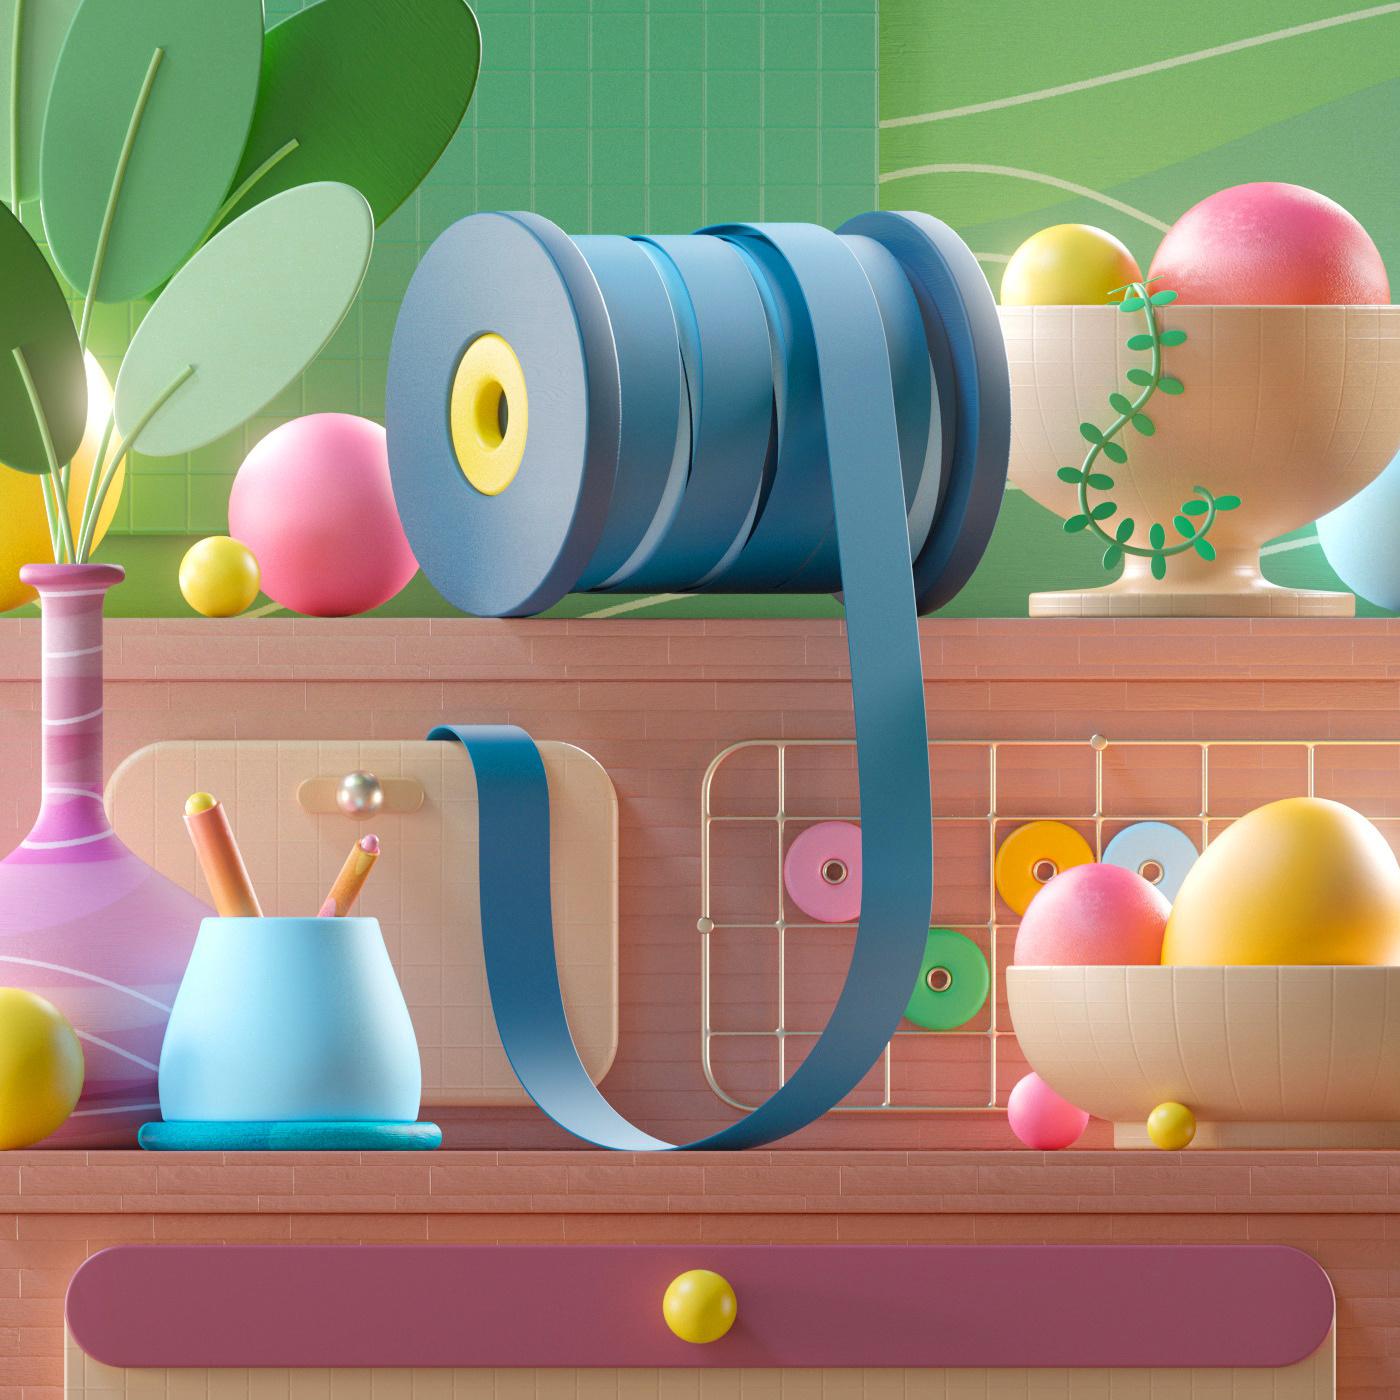 A colorful world - 36daysoftype 2021